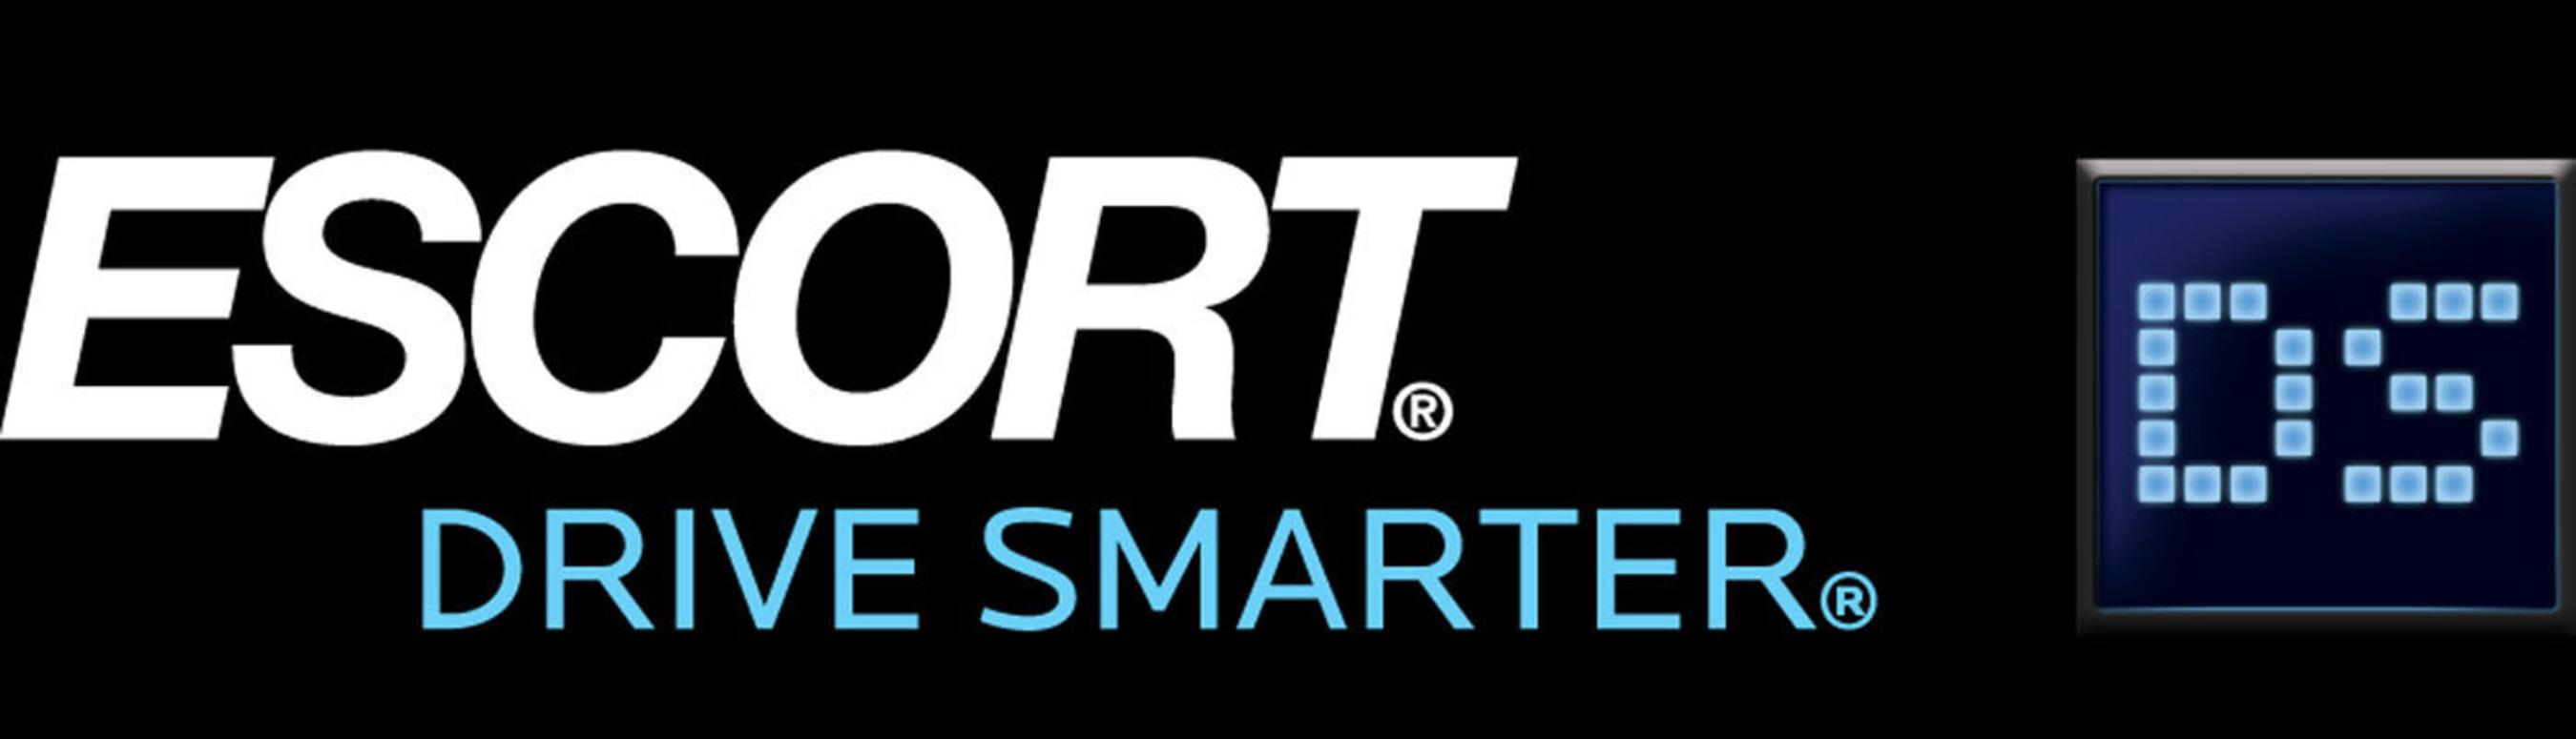 ESCORT logo. (PRNewsFoto/ESCORT, Inc.) (PRNewsFoto/ESCORT, INC.)